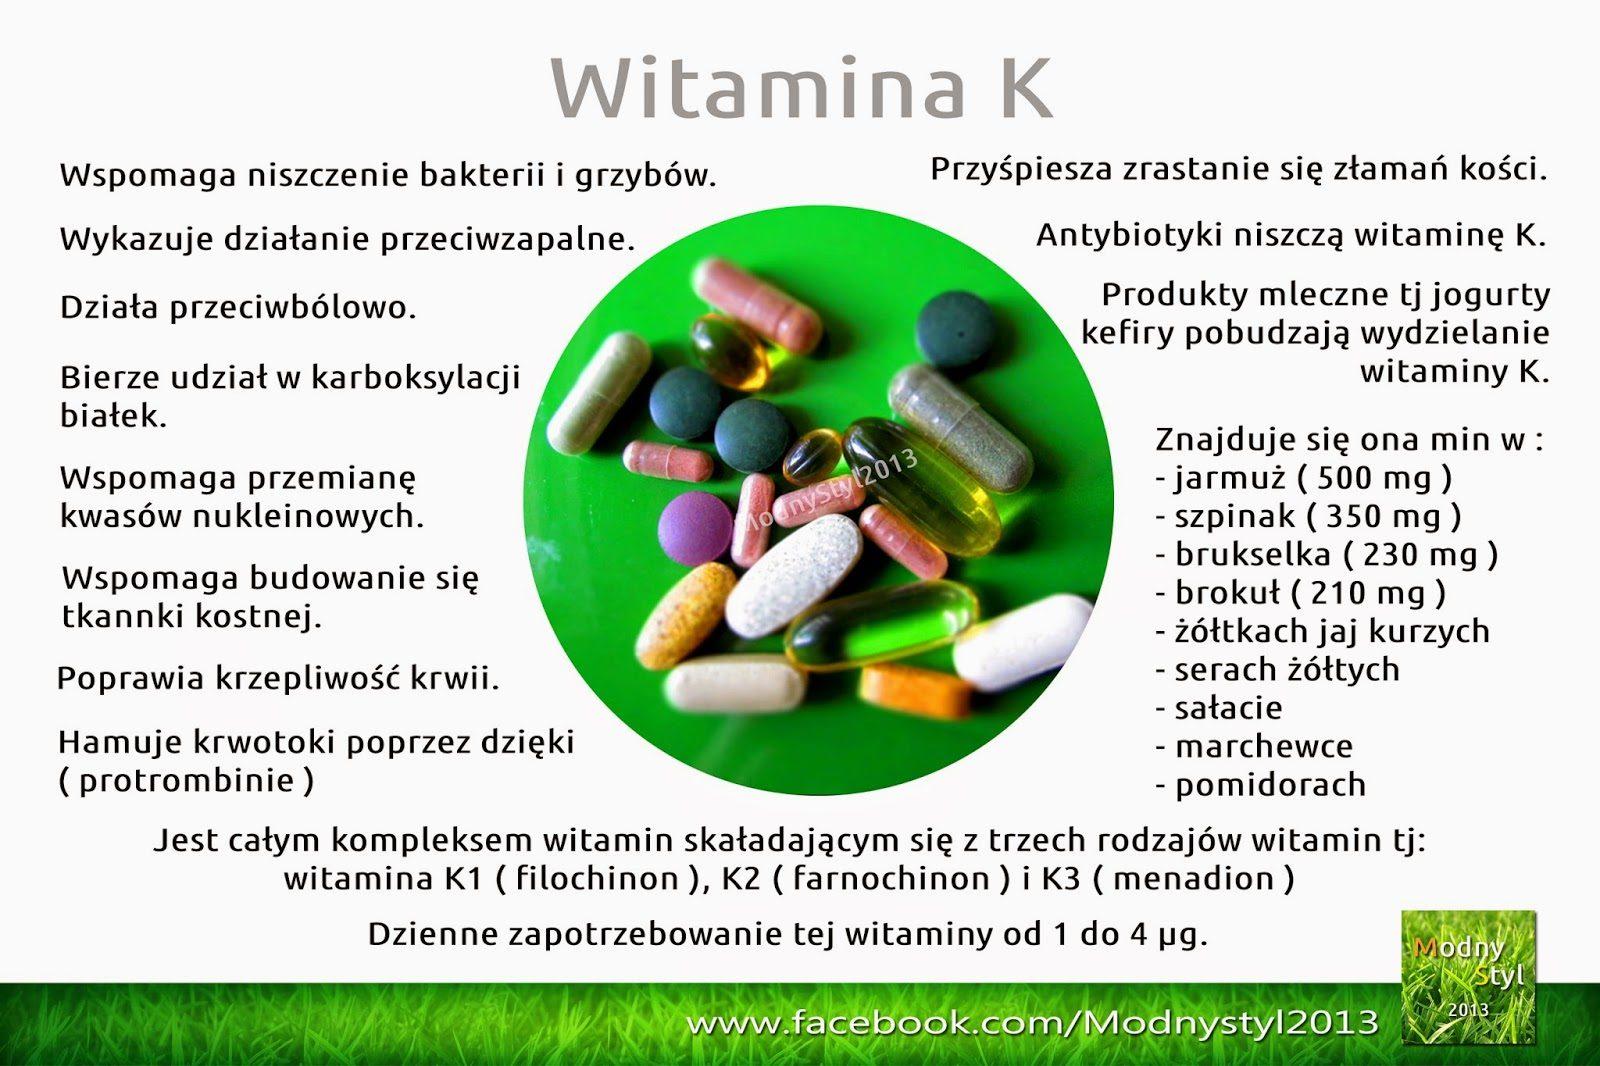 witamina2bk-9007361